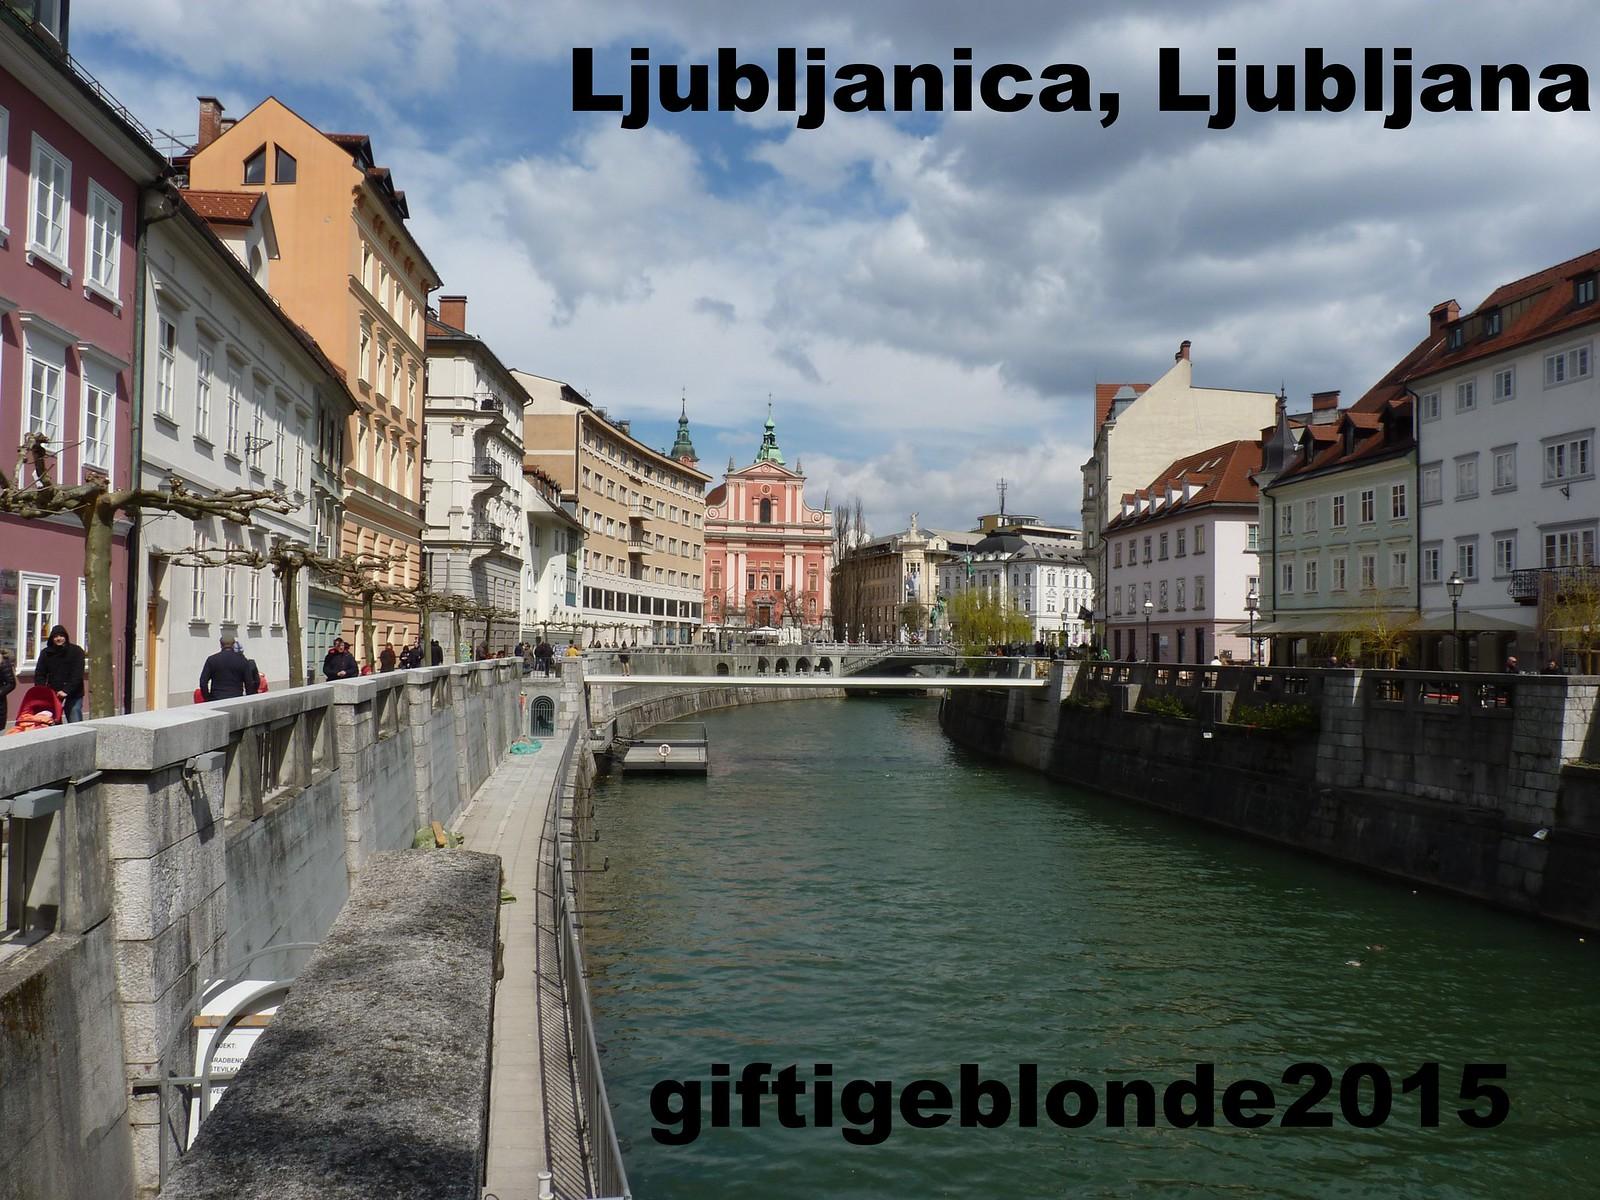 Slowenien, Ljubljana, Fluss Ljublanica